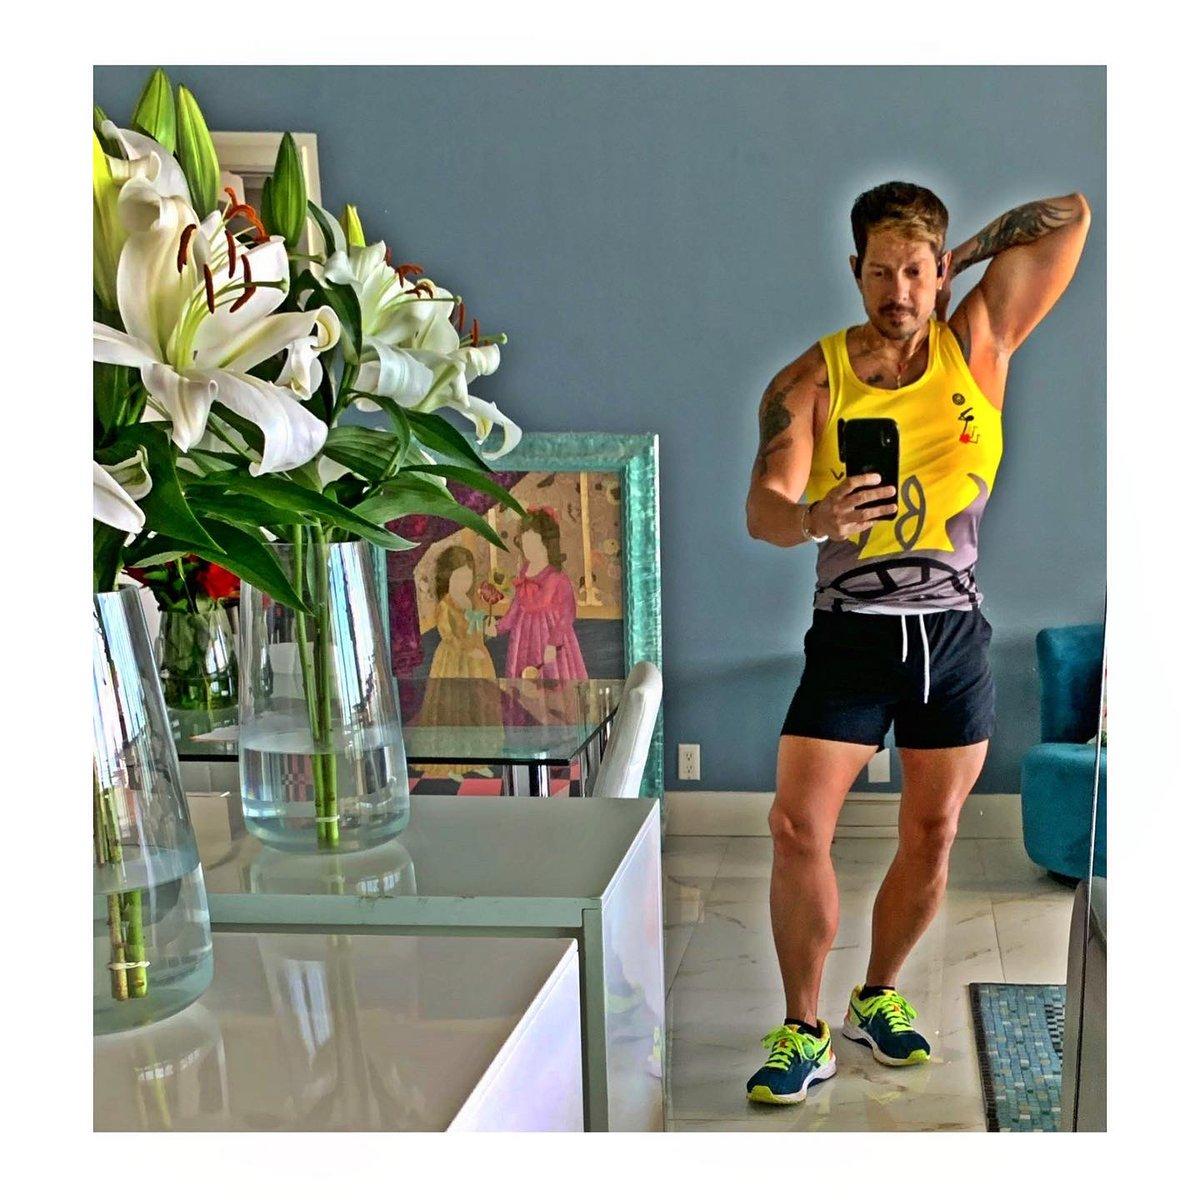 Mas pegao' que un peo 😂🤳🏻 - el espejo hace maravillas 💥💛 - vamo' pal' gym #derek #derekdiaz #selfie #mondaymotivation #monday #mondaymorning #manicmonday #yellow #workout #workoutoftheday #pegaito #fitnessjourney #gaymen #gayfitness #fitguys #fitnessgoals #fitnessmotivation